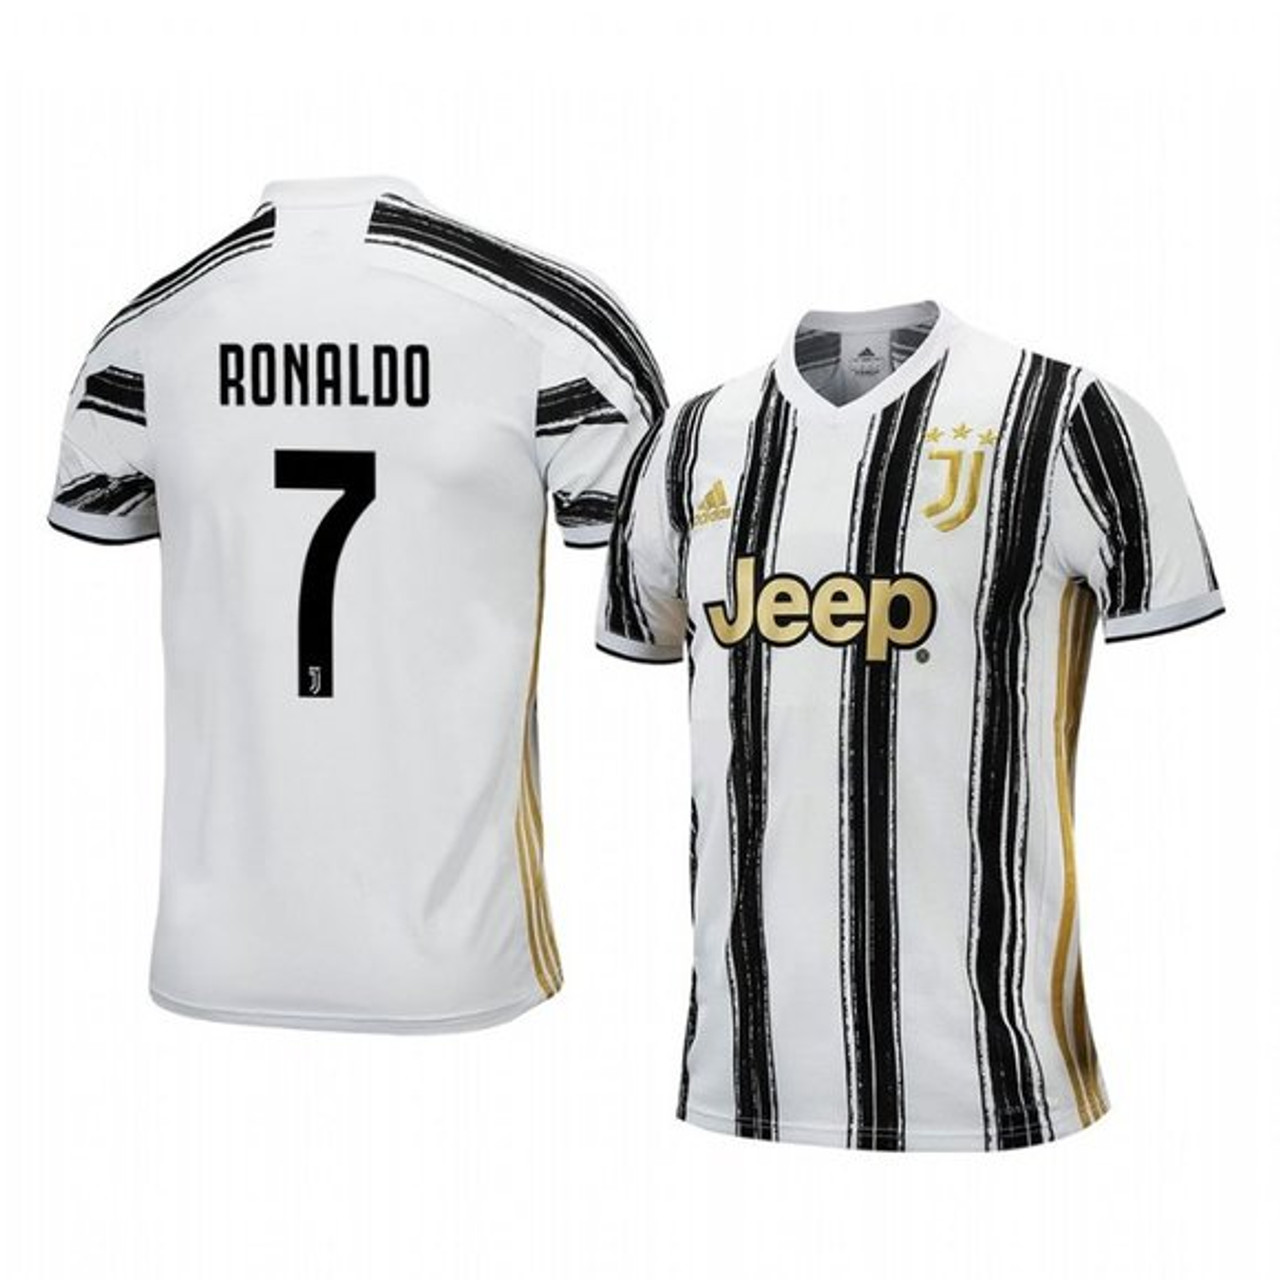 adidas juventus 2021 ronaldo home jersey soccer plus adidas juventus 2021 ronaldo home jersey